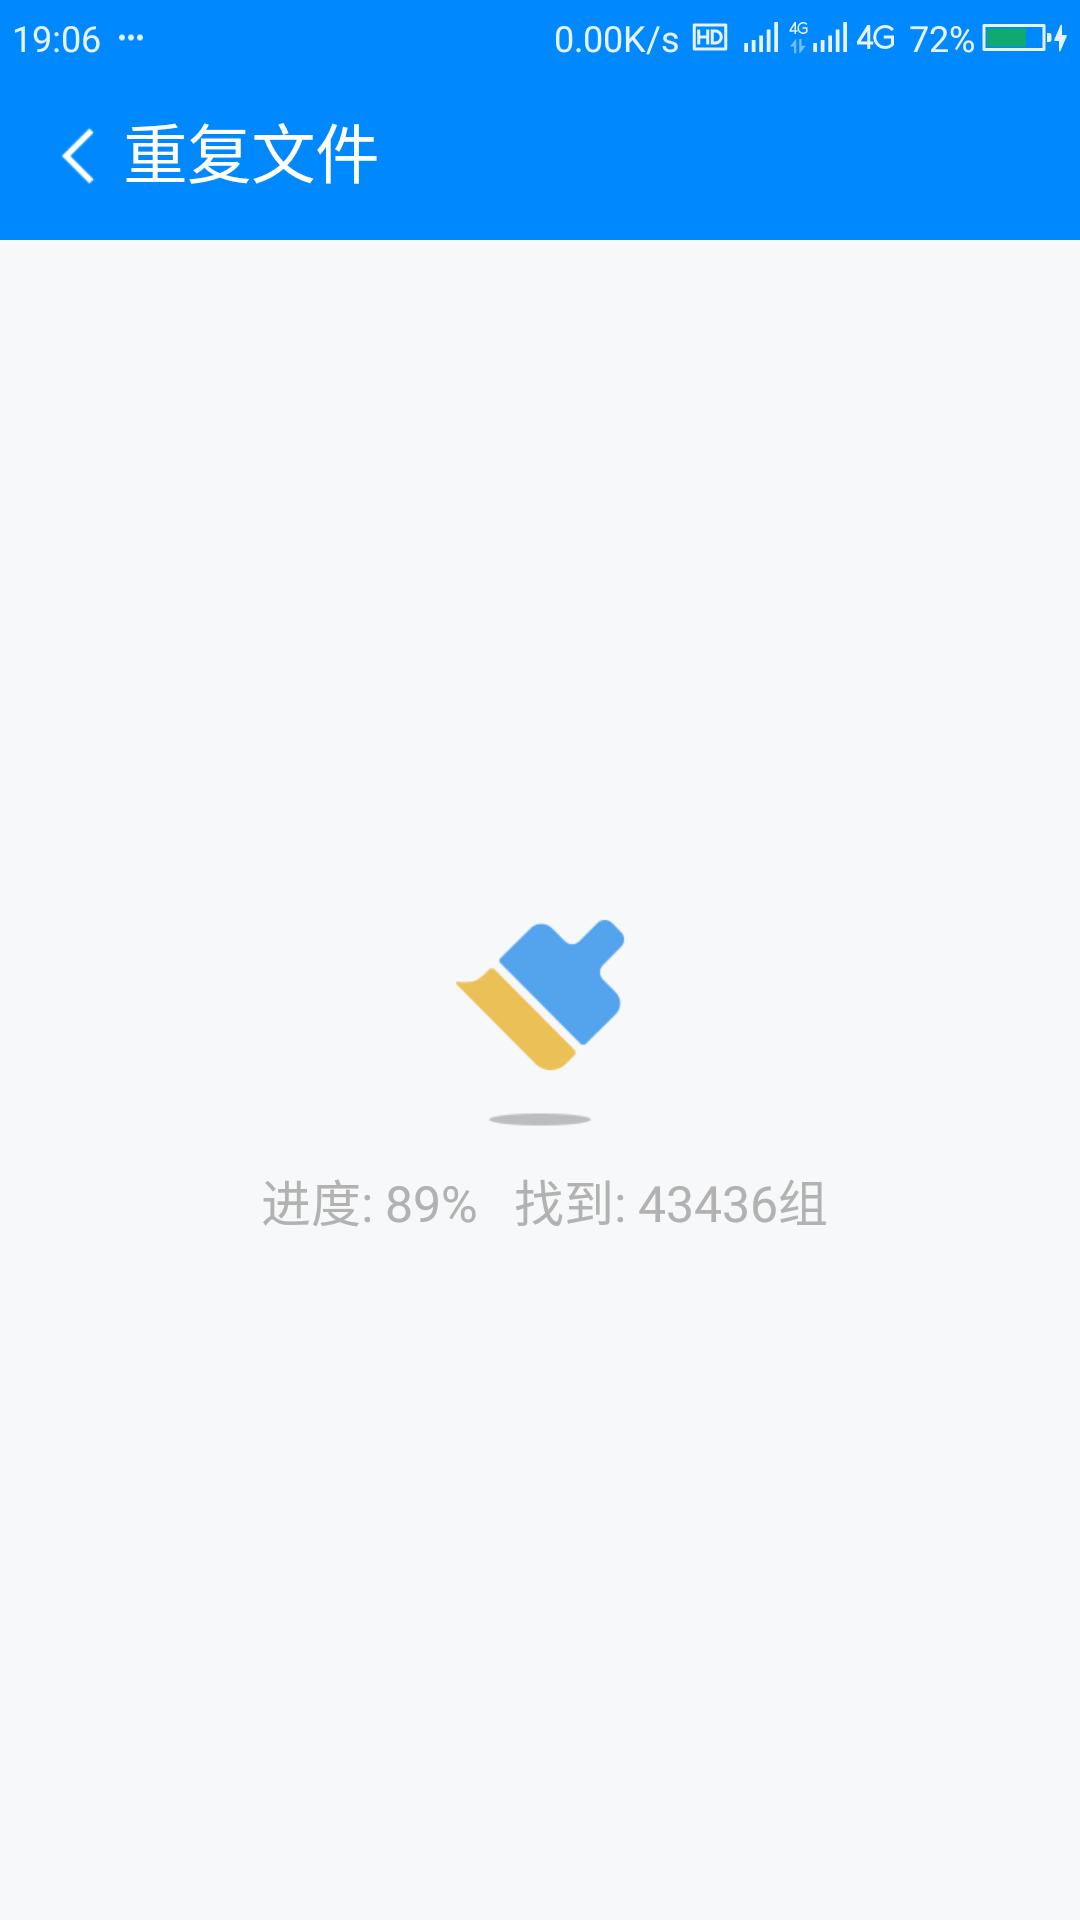 Screenshot_2019-09-07-19-06-46.png